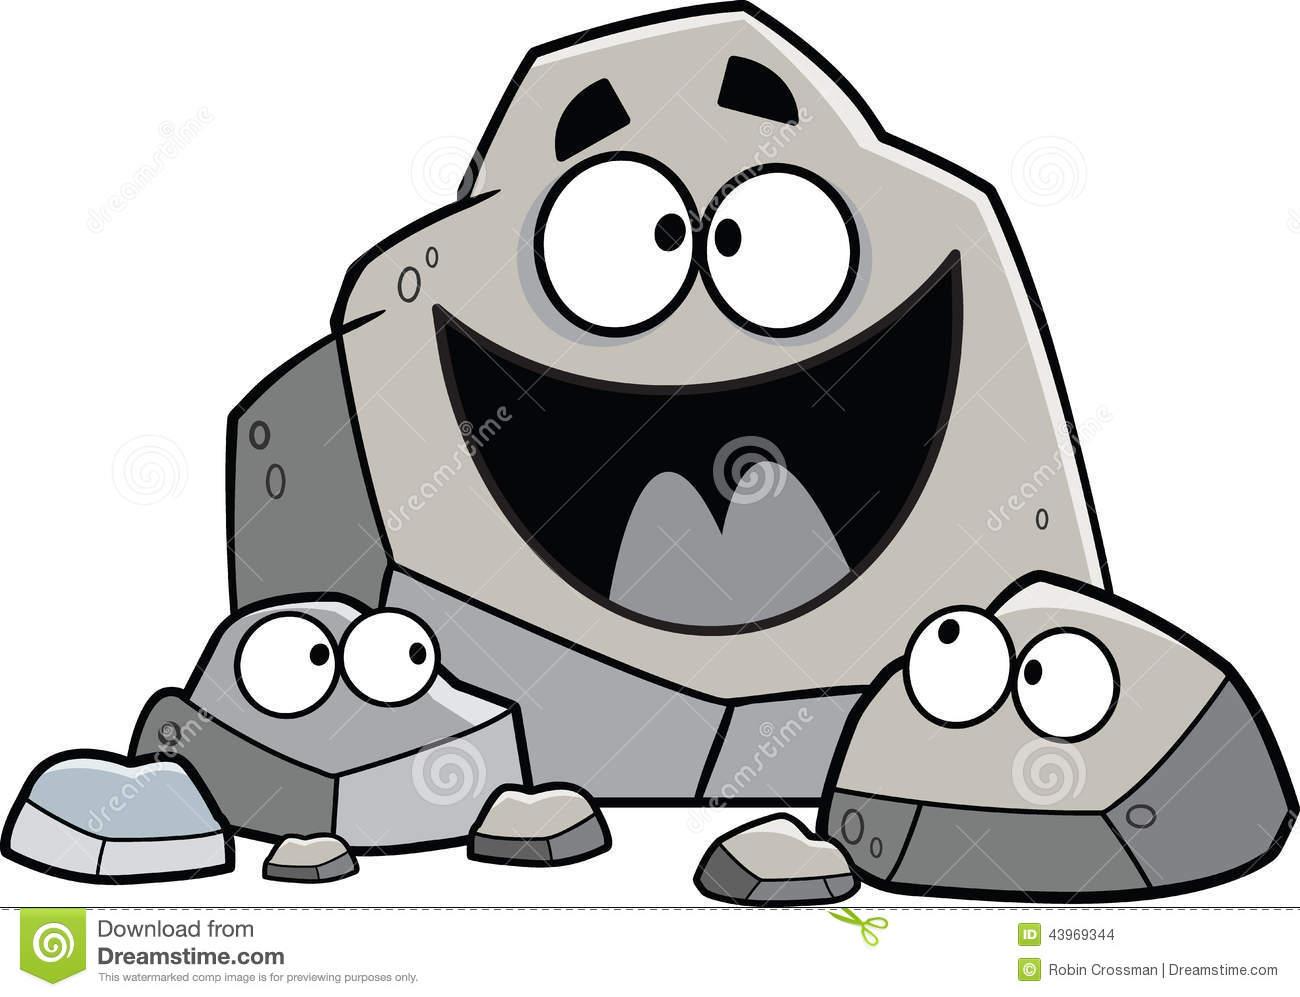 Cartoon Rock Family Illustrated Set Rocks Theme 43969344 Jpg